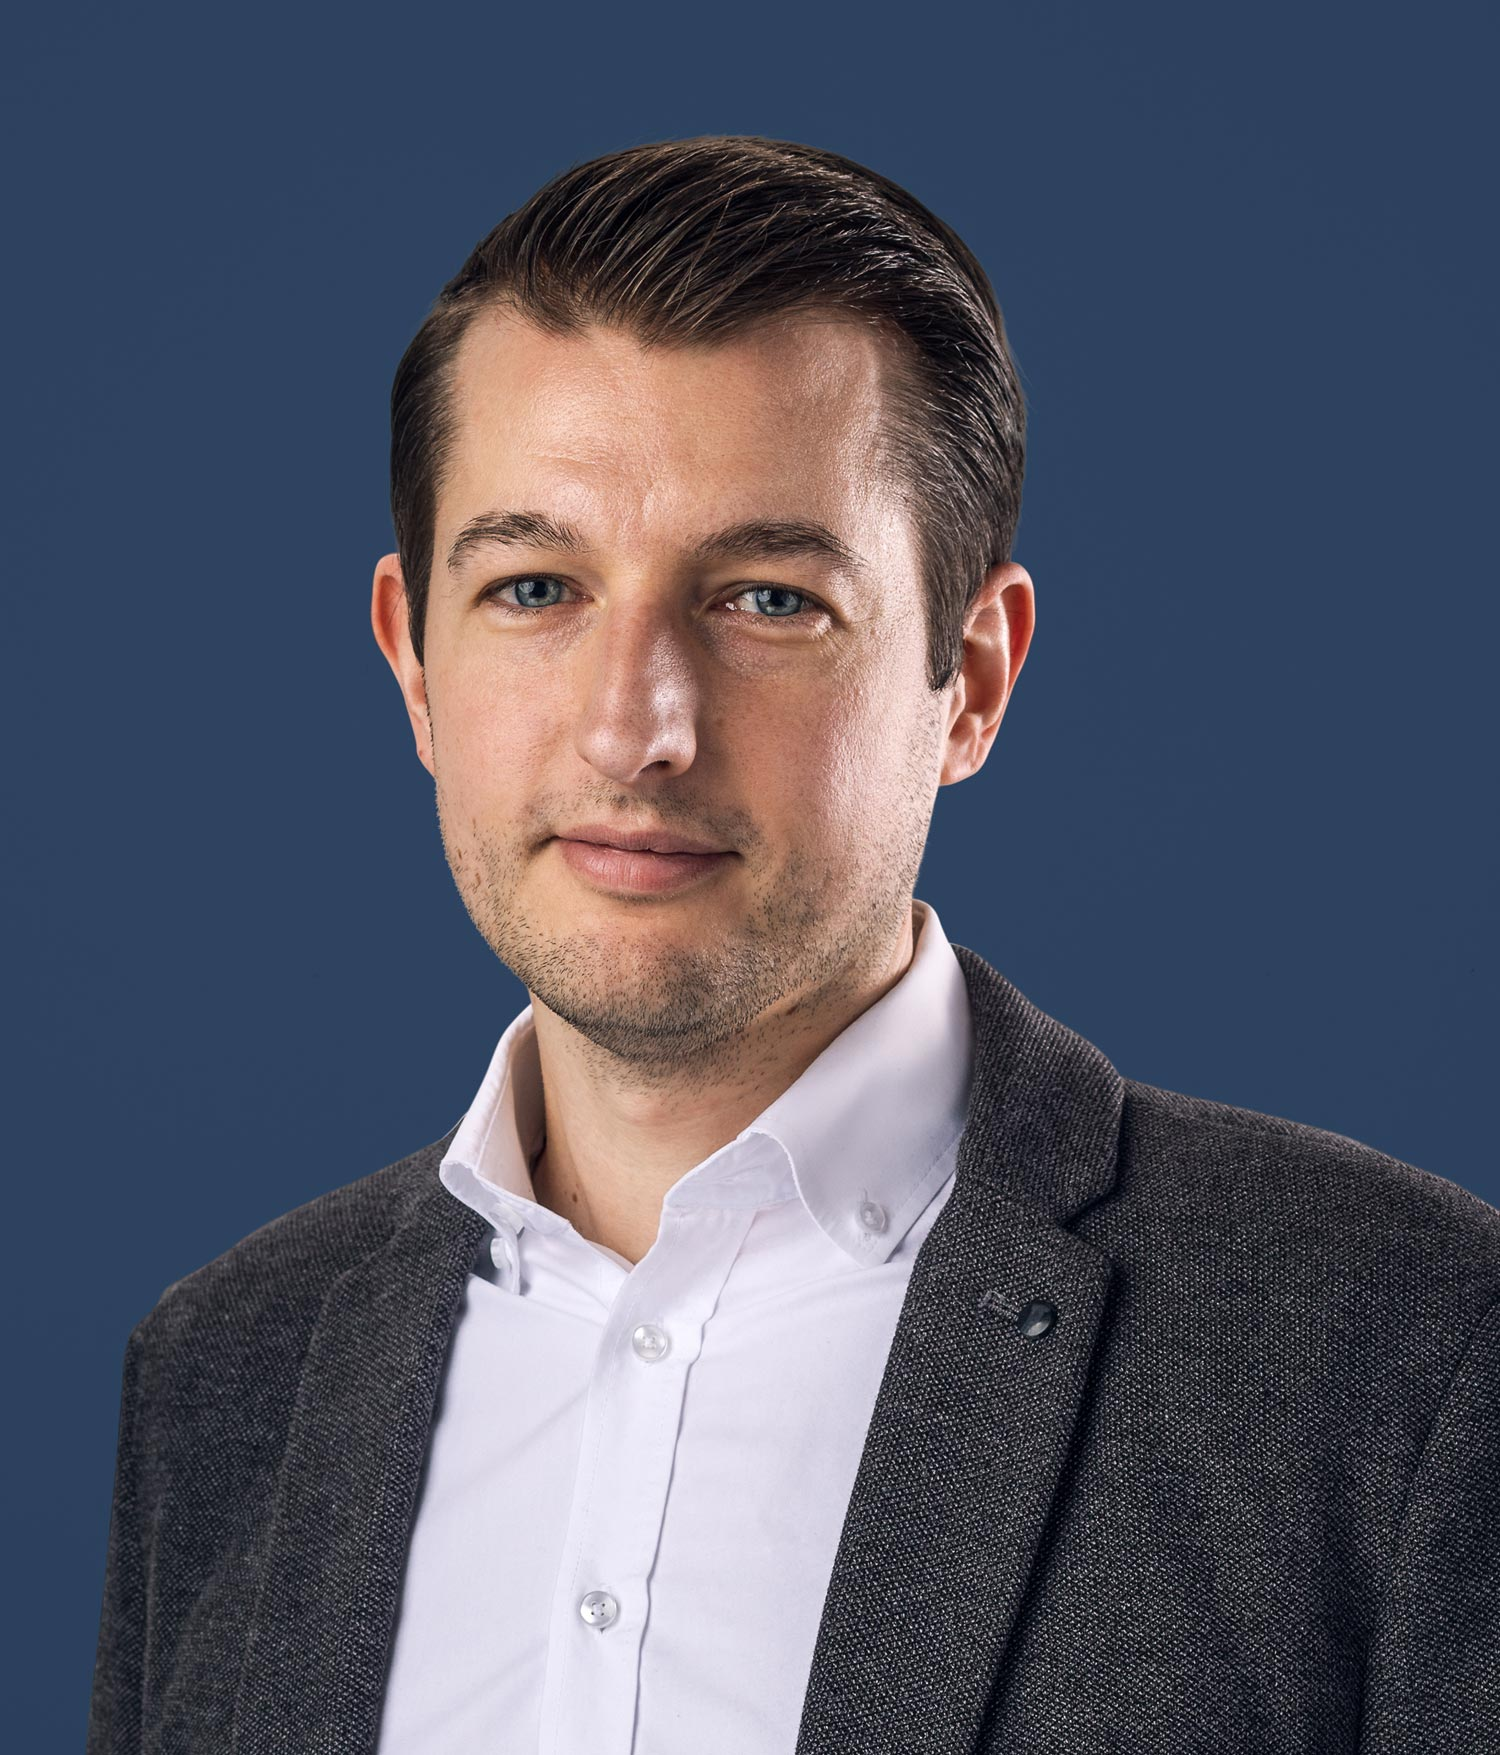 Bastian Krussek